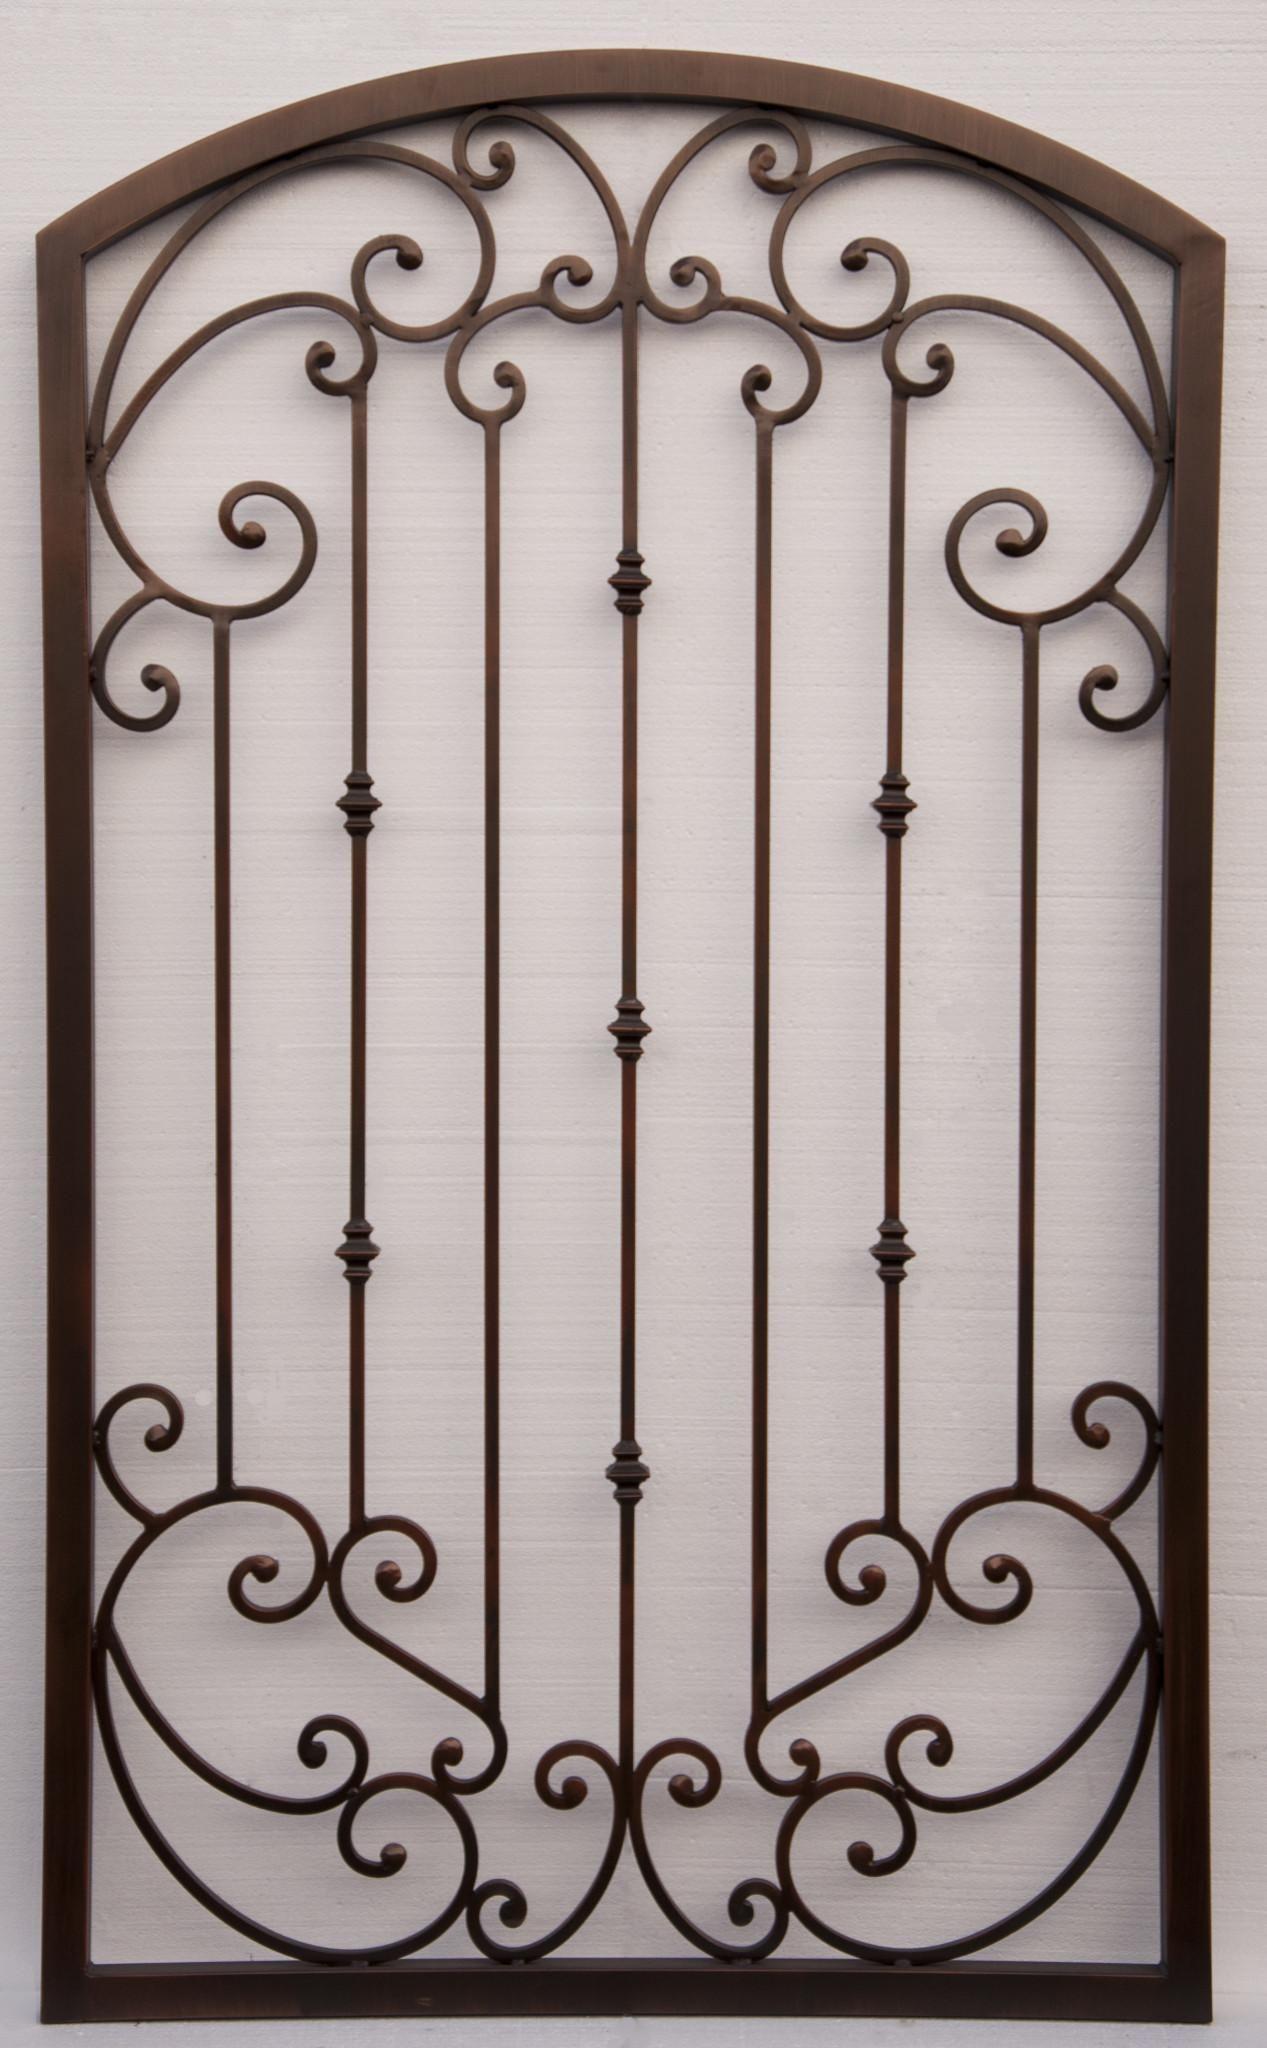 Wrought Iron Gates Ornamental Gates Affordable Fence And Gates Wrought Iron Gate Designs Ornamental Iron Gates Iron Gates